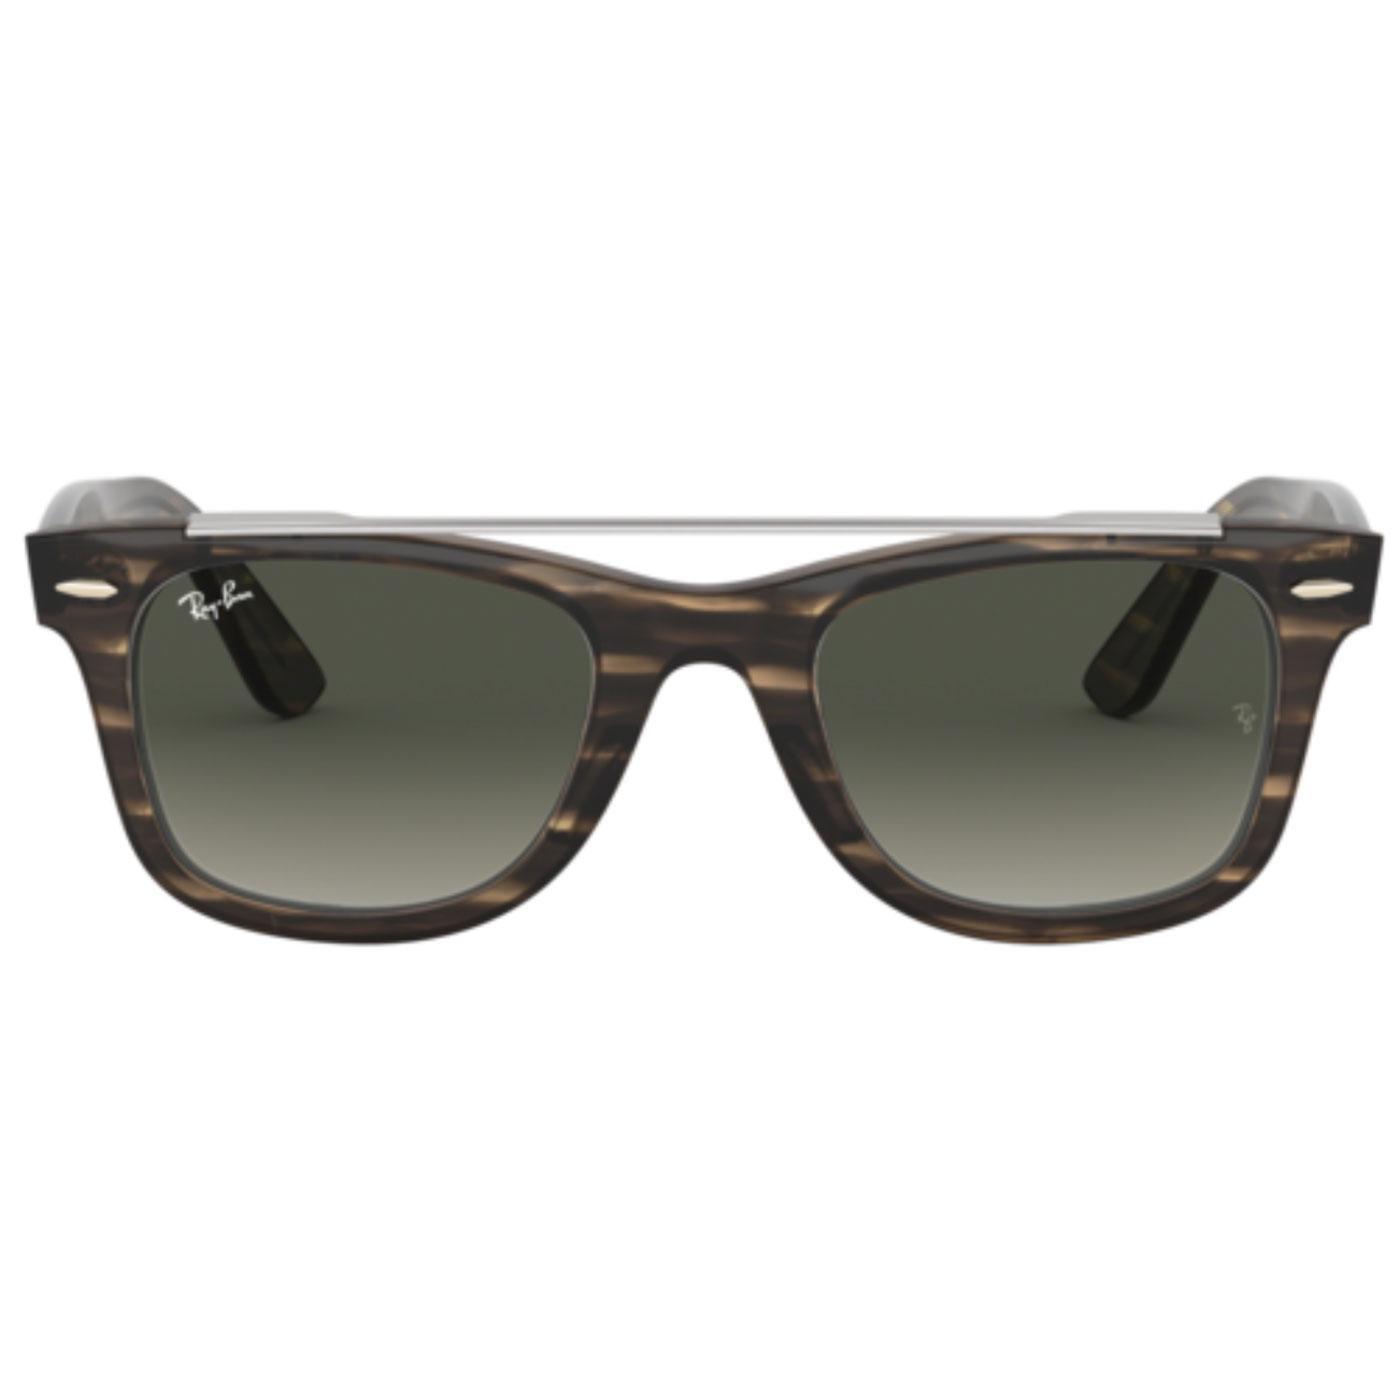 RAY-BAN Stripped Brow Bar Wayfarer Sunglasses (Br)